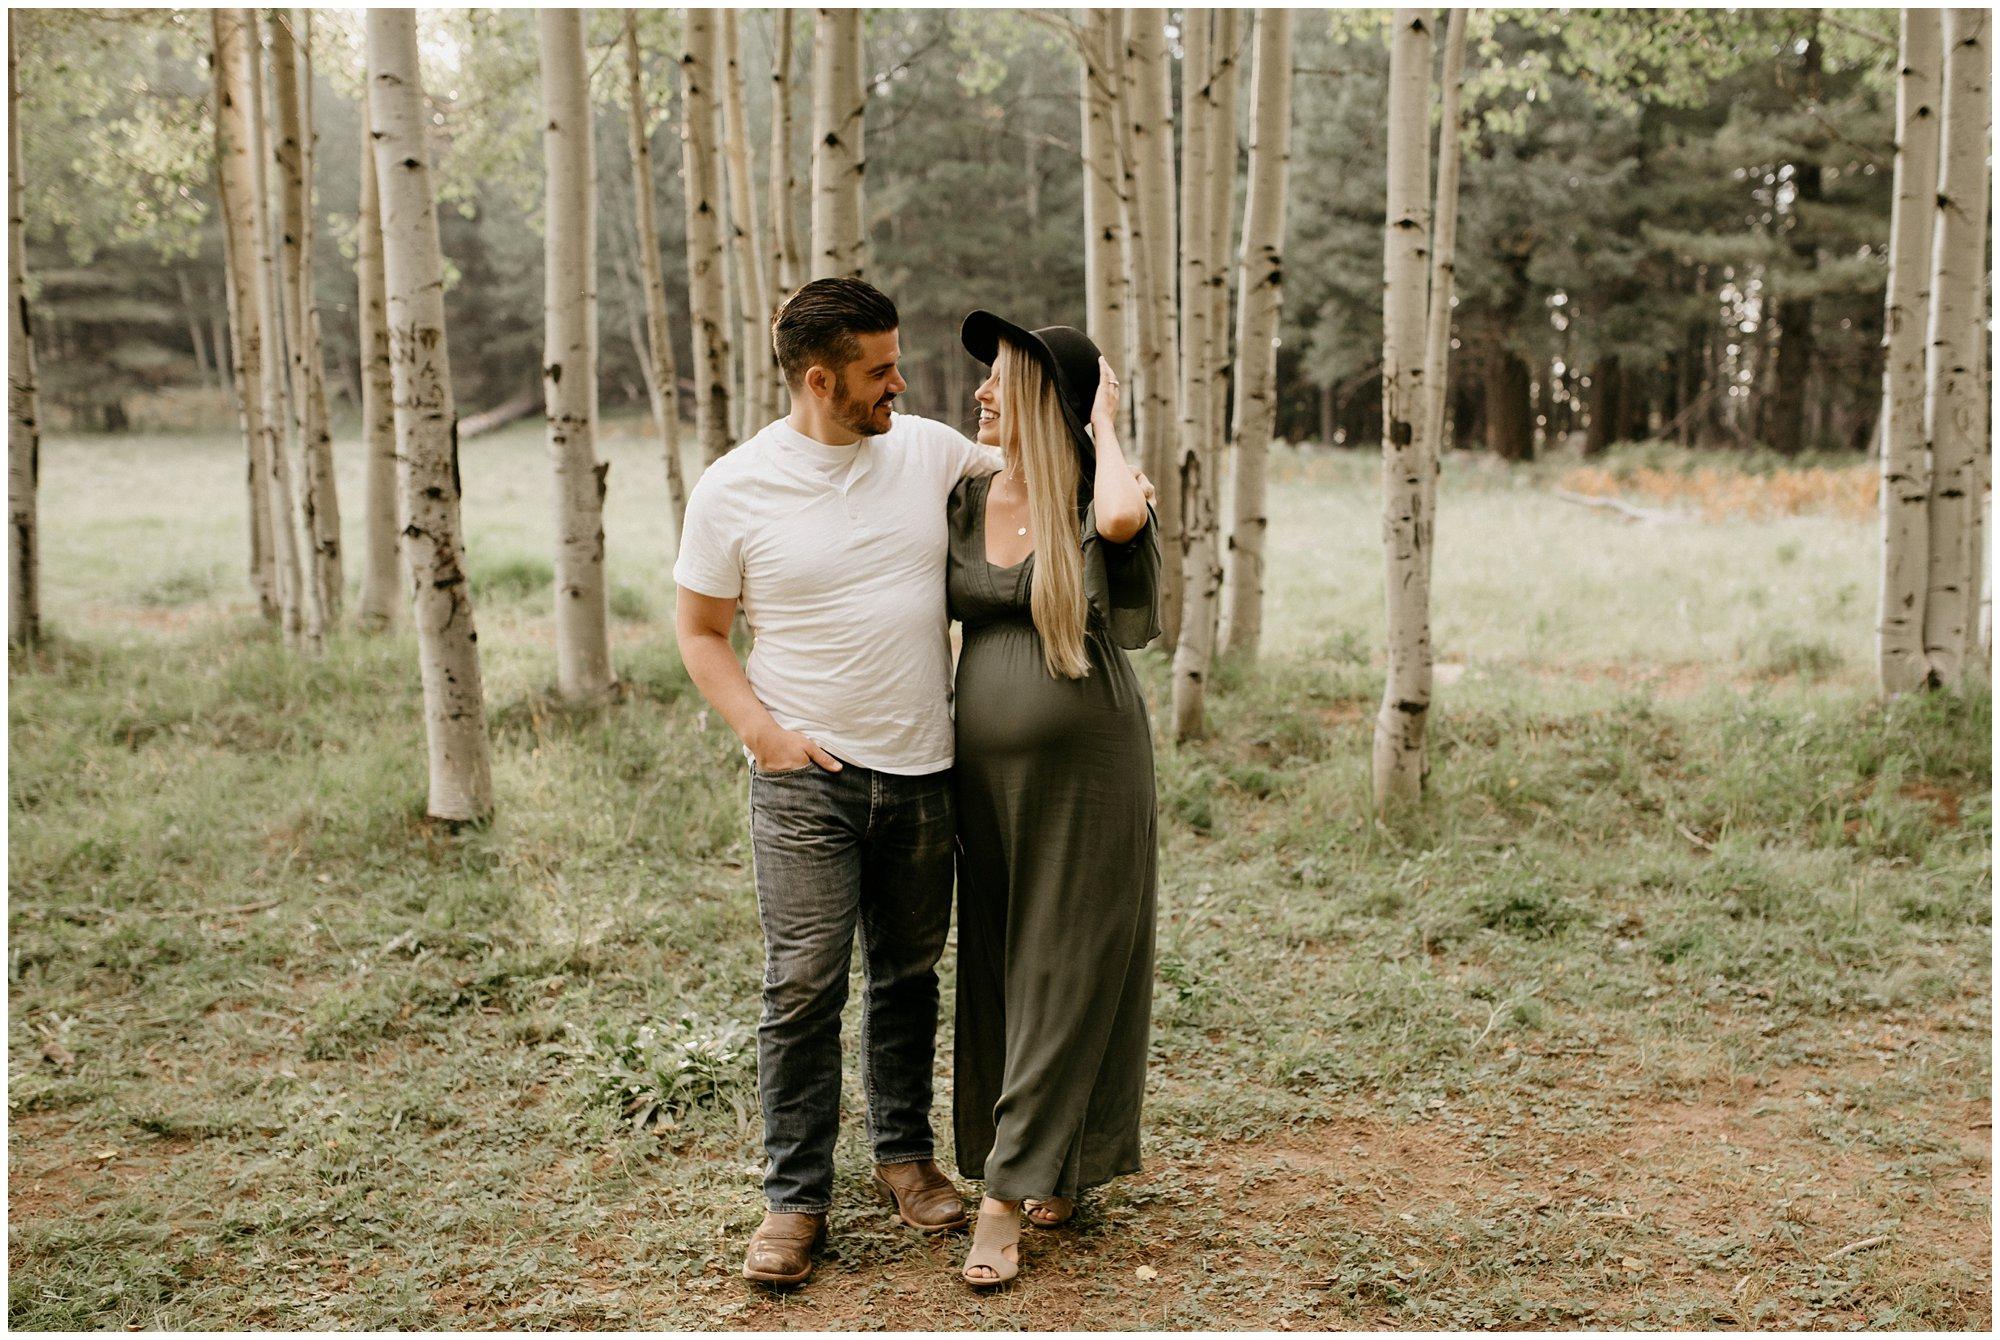 Flagstaff Aspen Tree Portrait Session - Gabby + Gary - Ashtyn Nicole Photo_0029.jpg